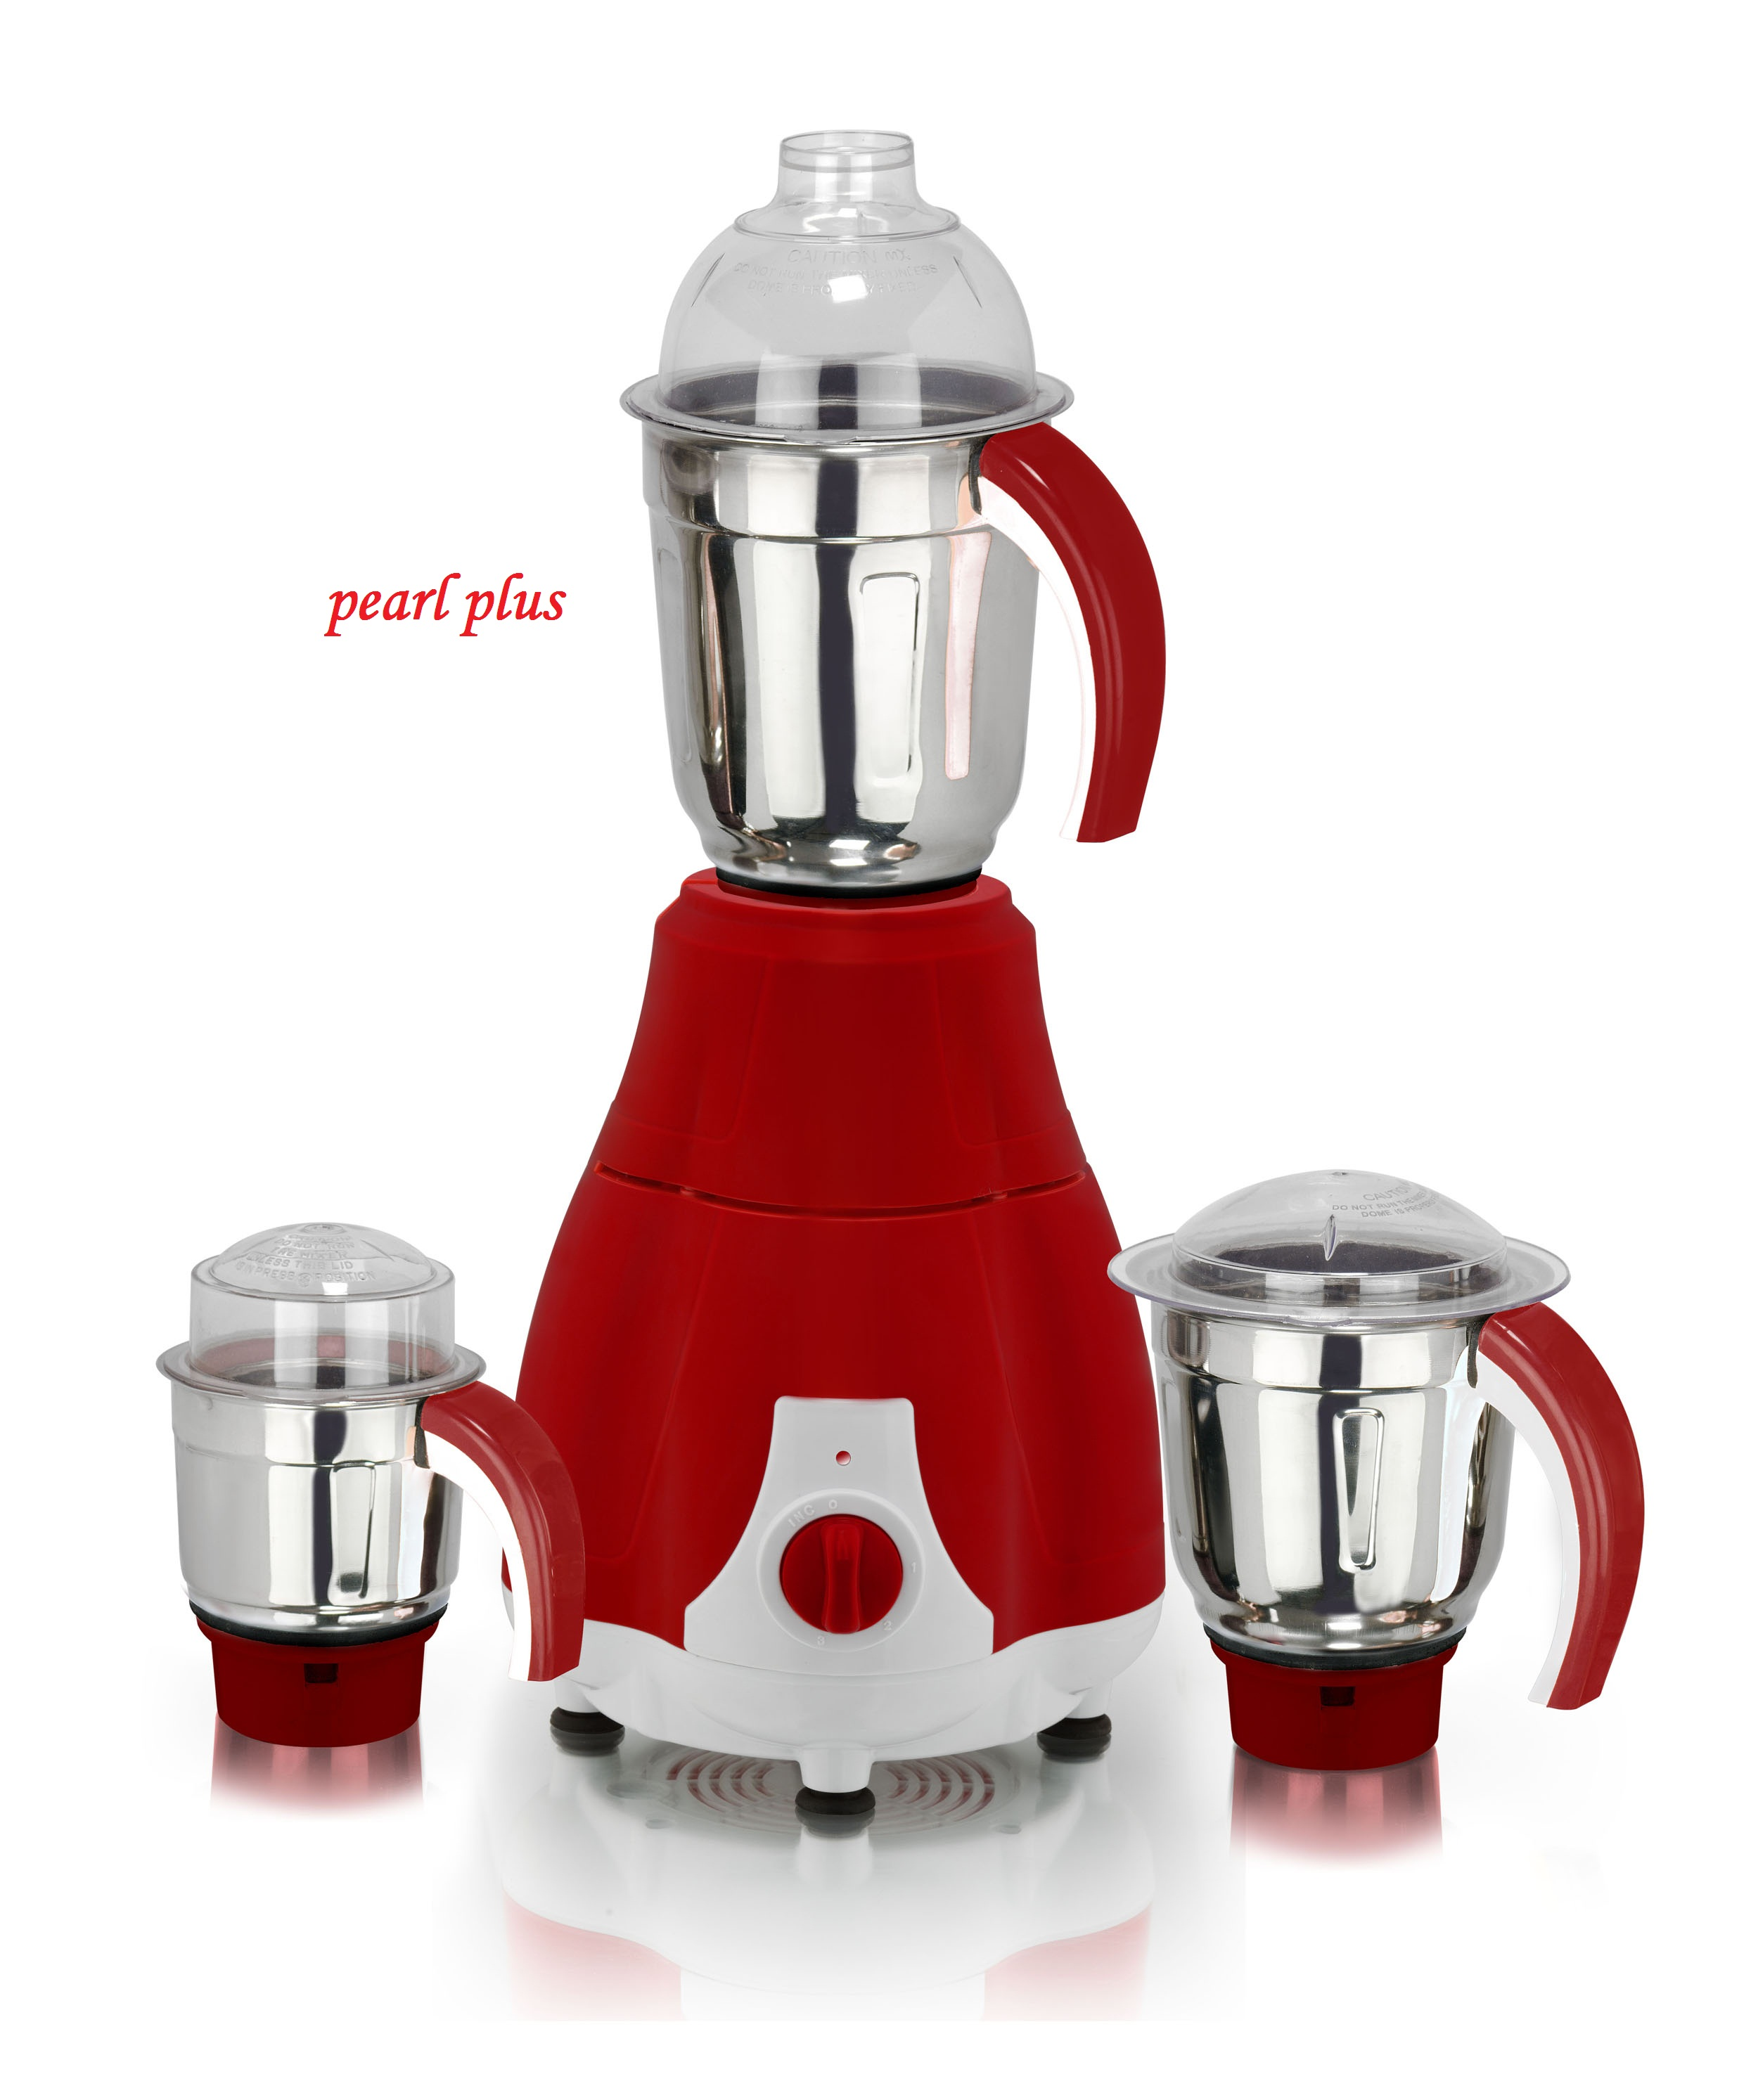 Super-Max-Pearlplus-Mixer-Grinder